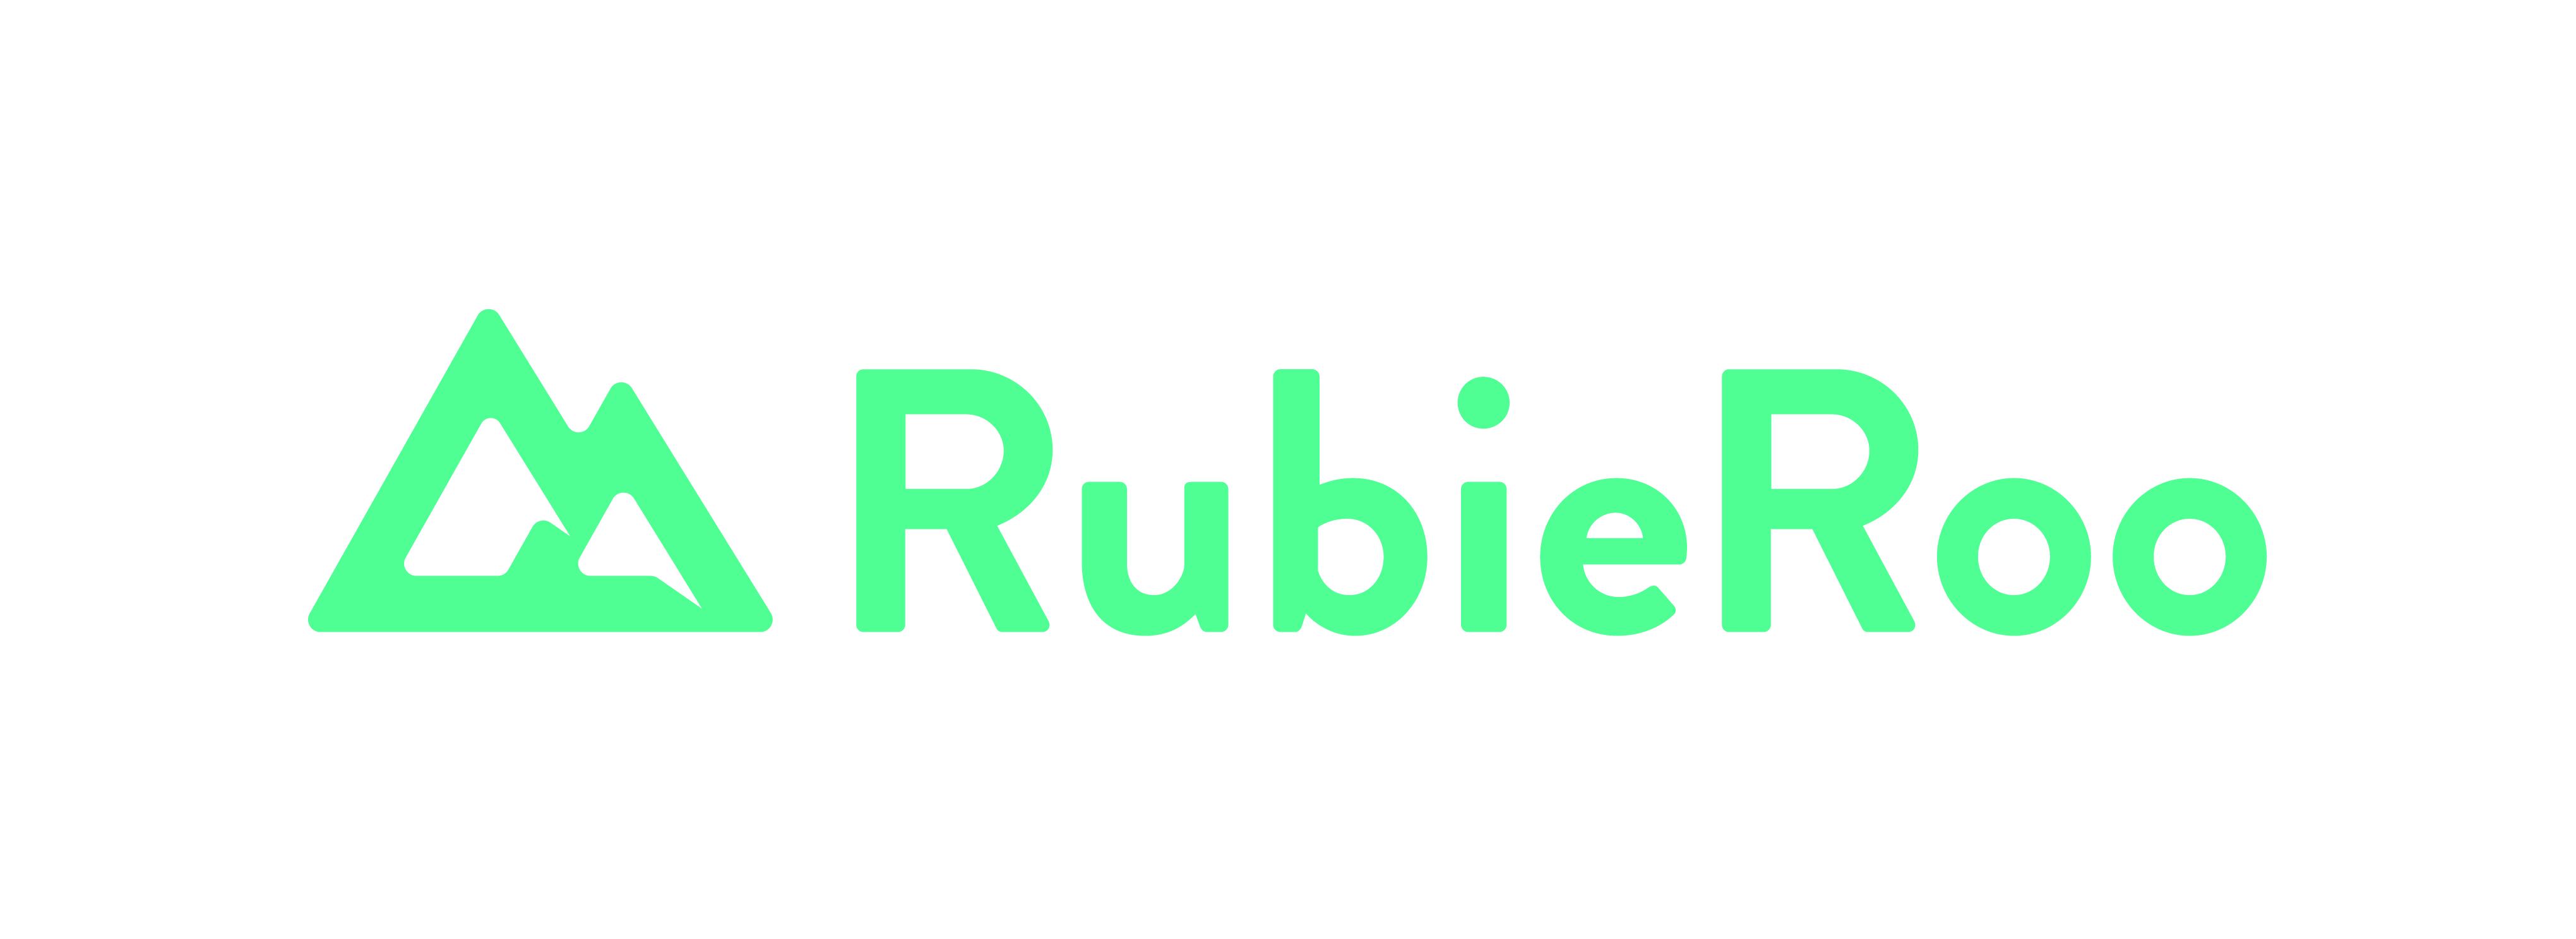 Rubieroo colour logo